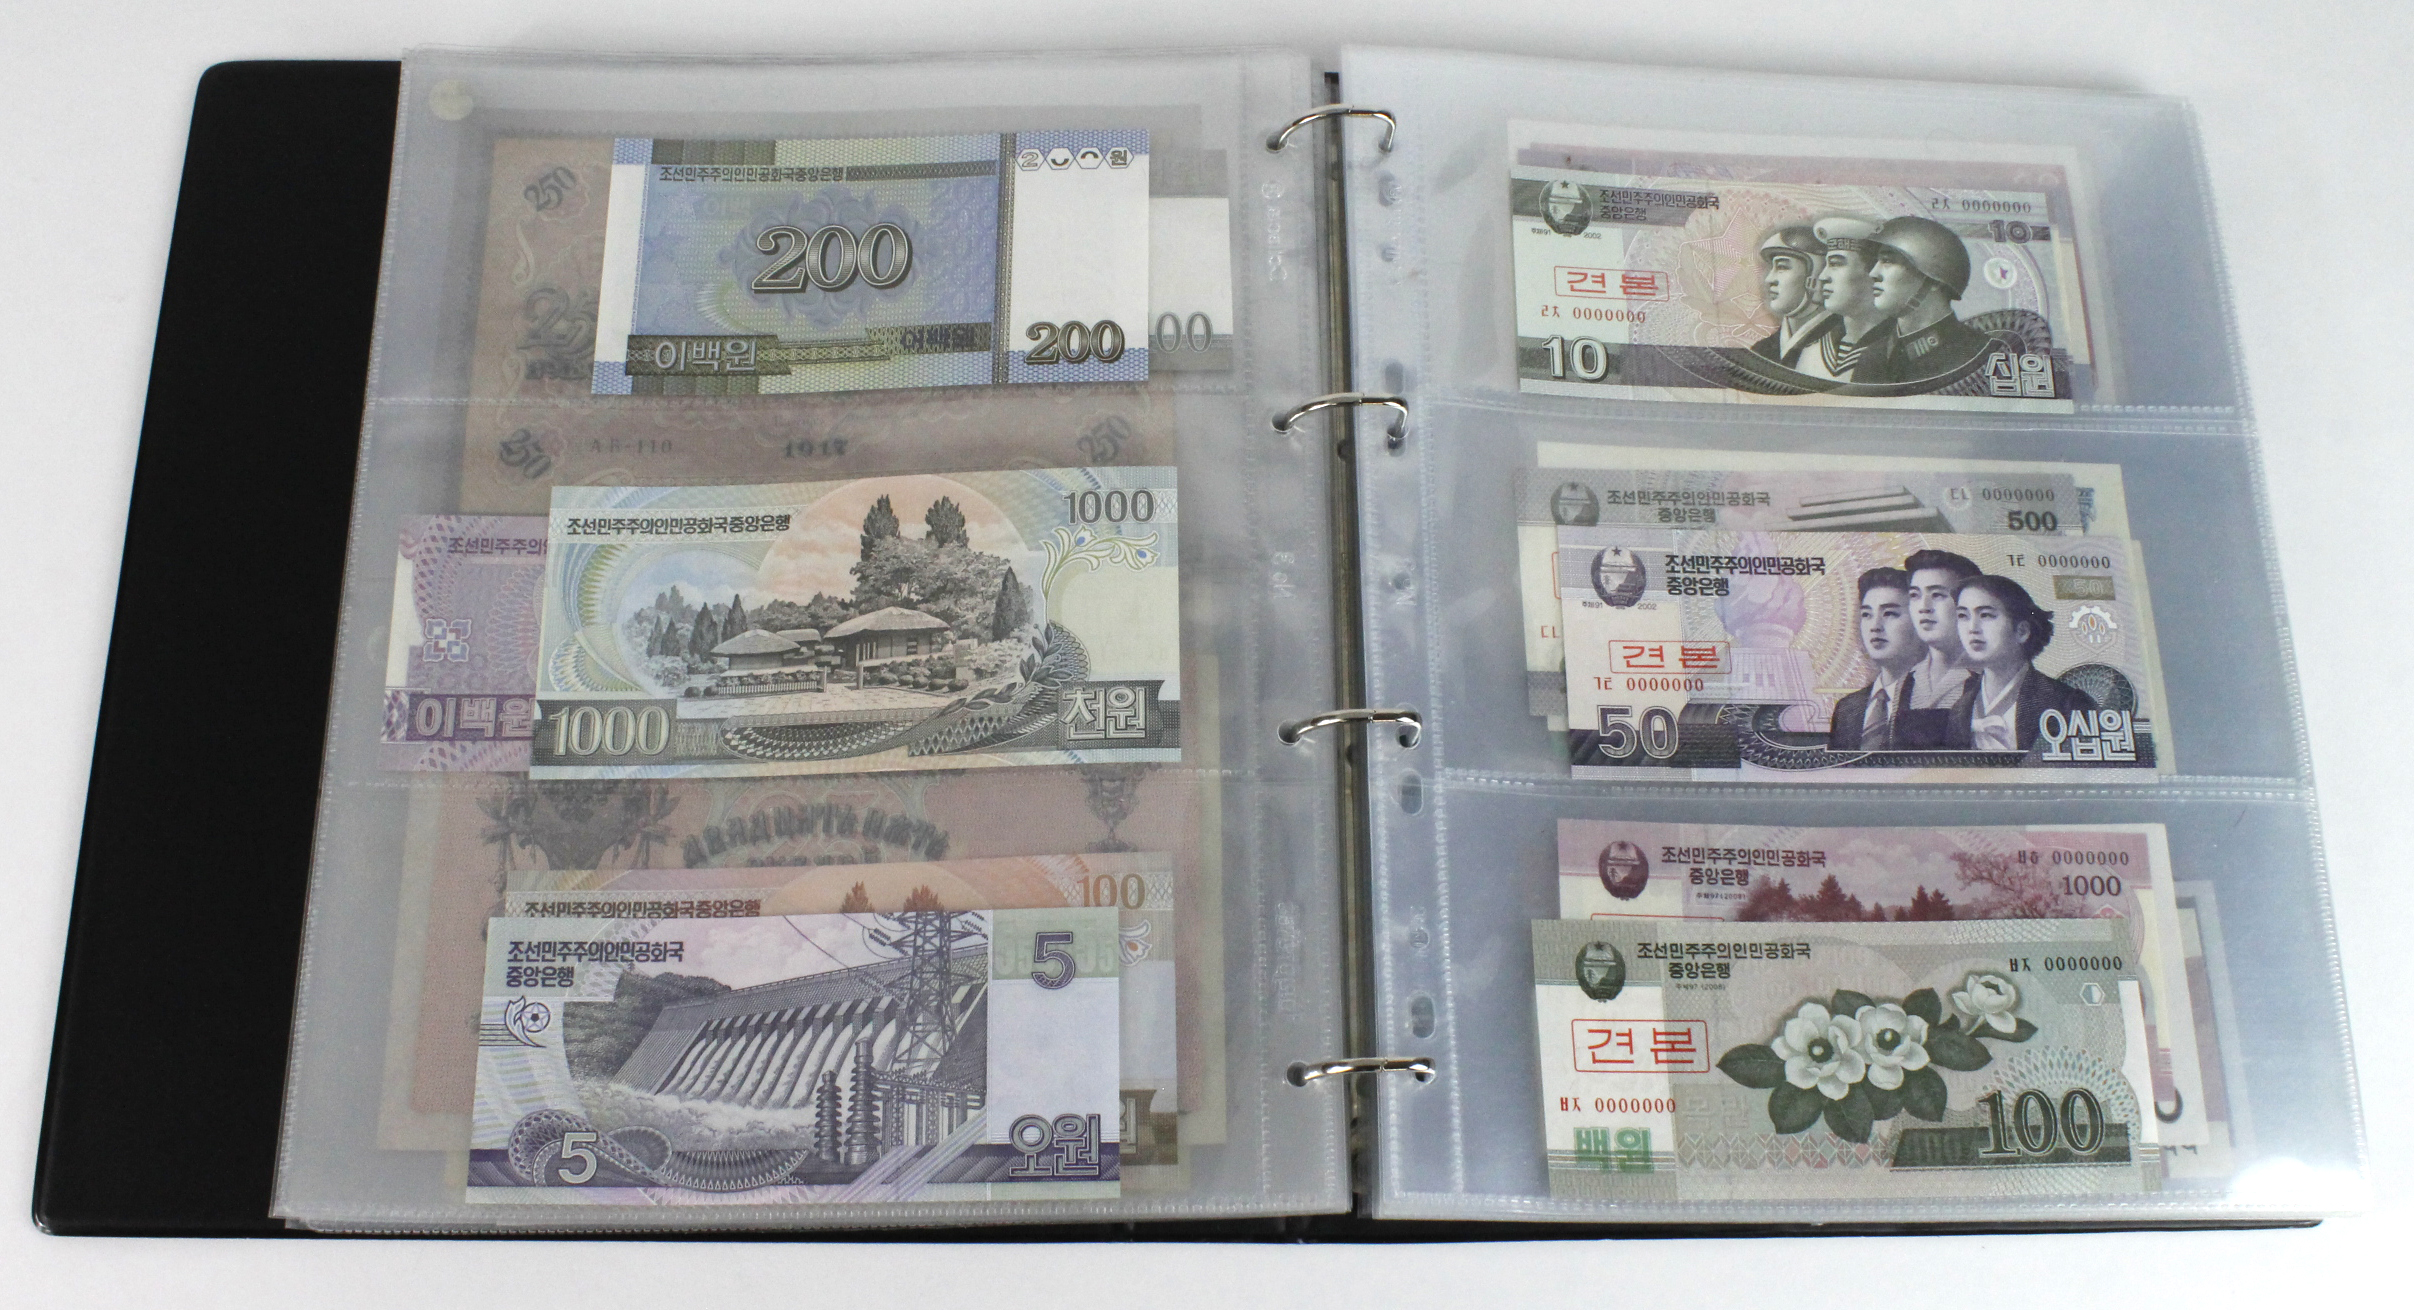 World (163), in banknote album including Bahamas, Spain, Sweden, Netherlands, Algeria, Macau, - Image 25 of 57